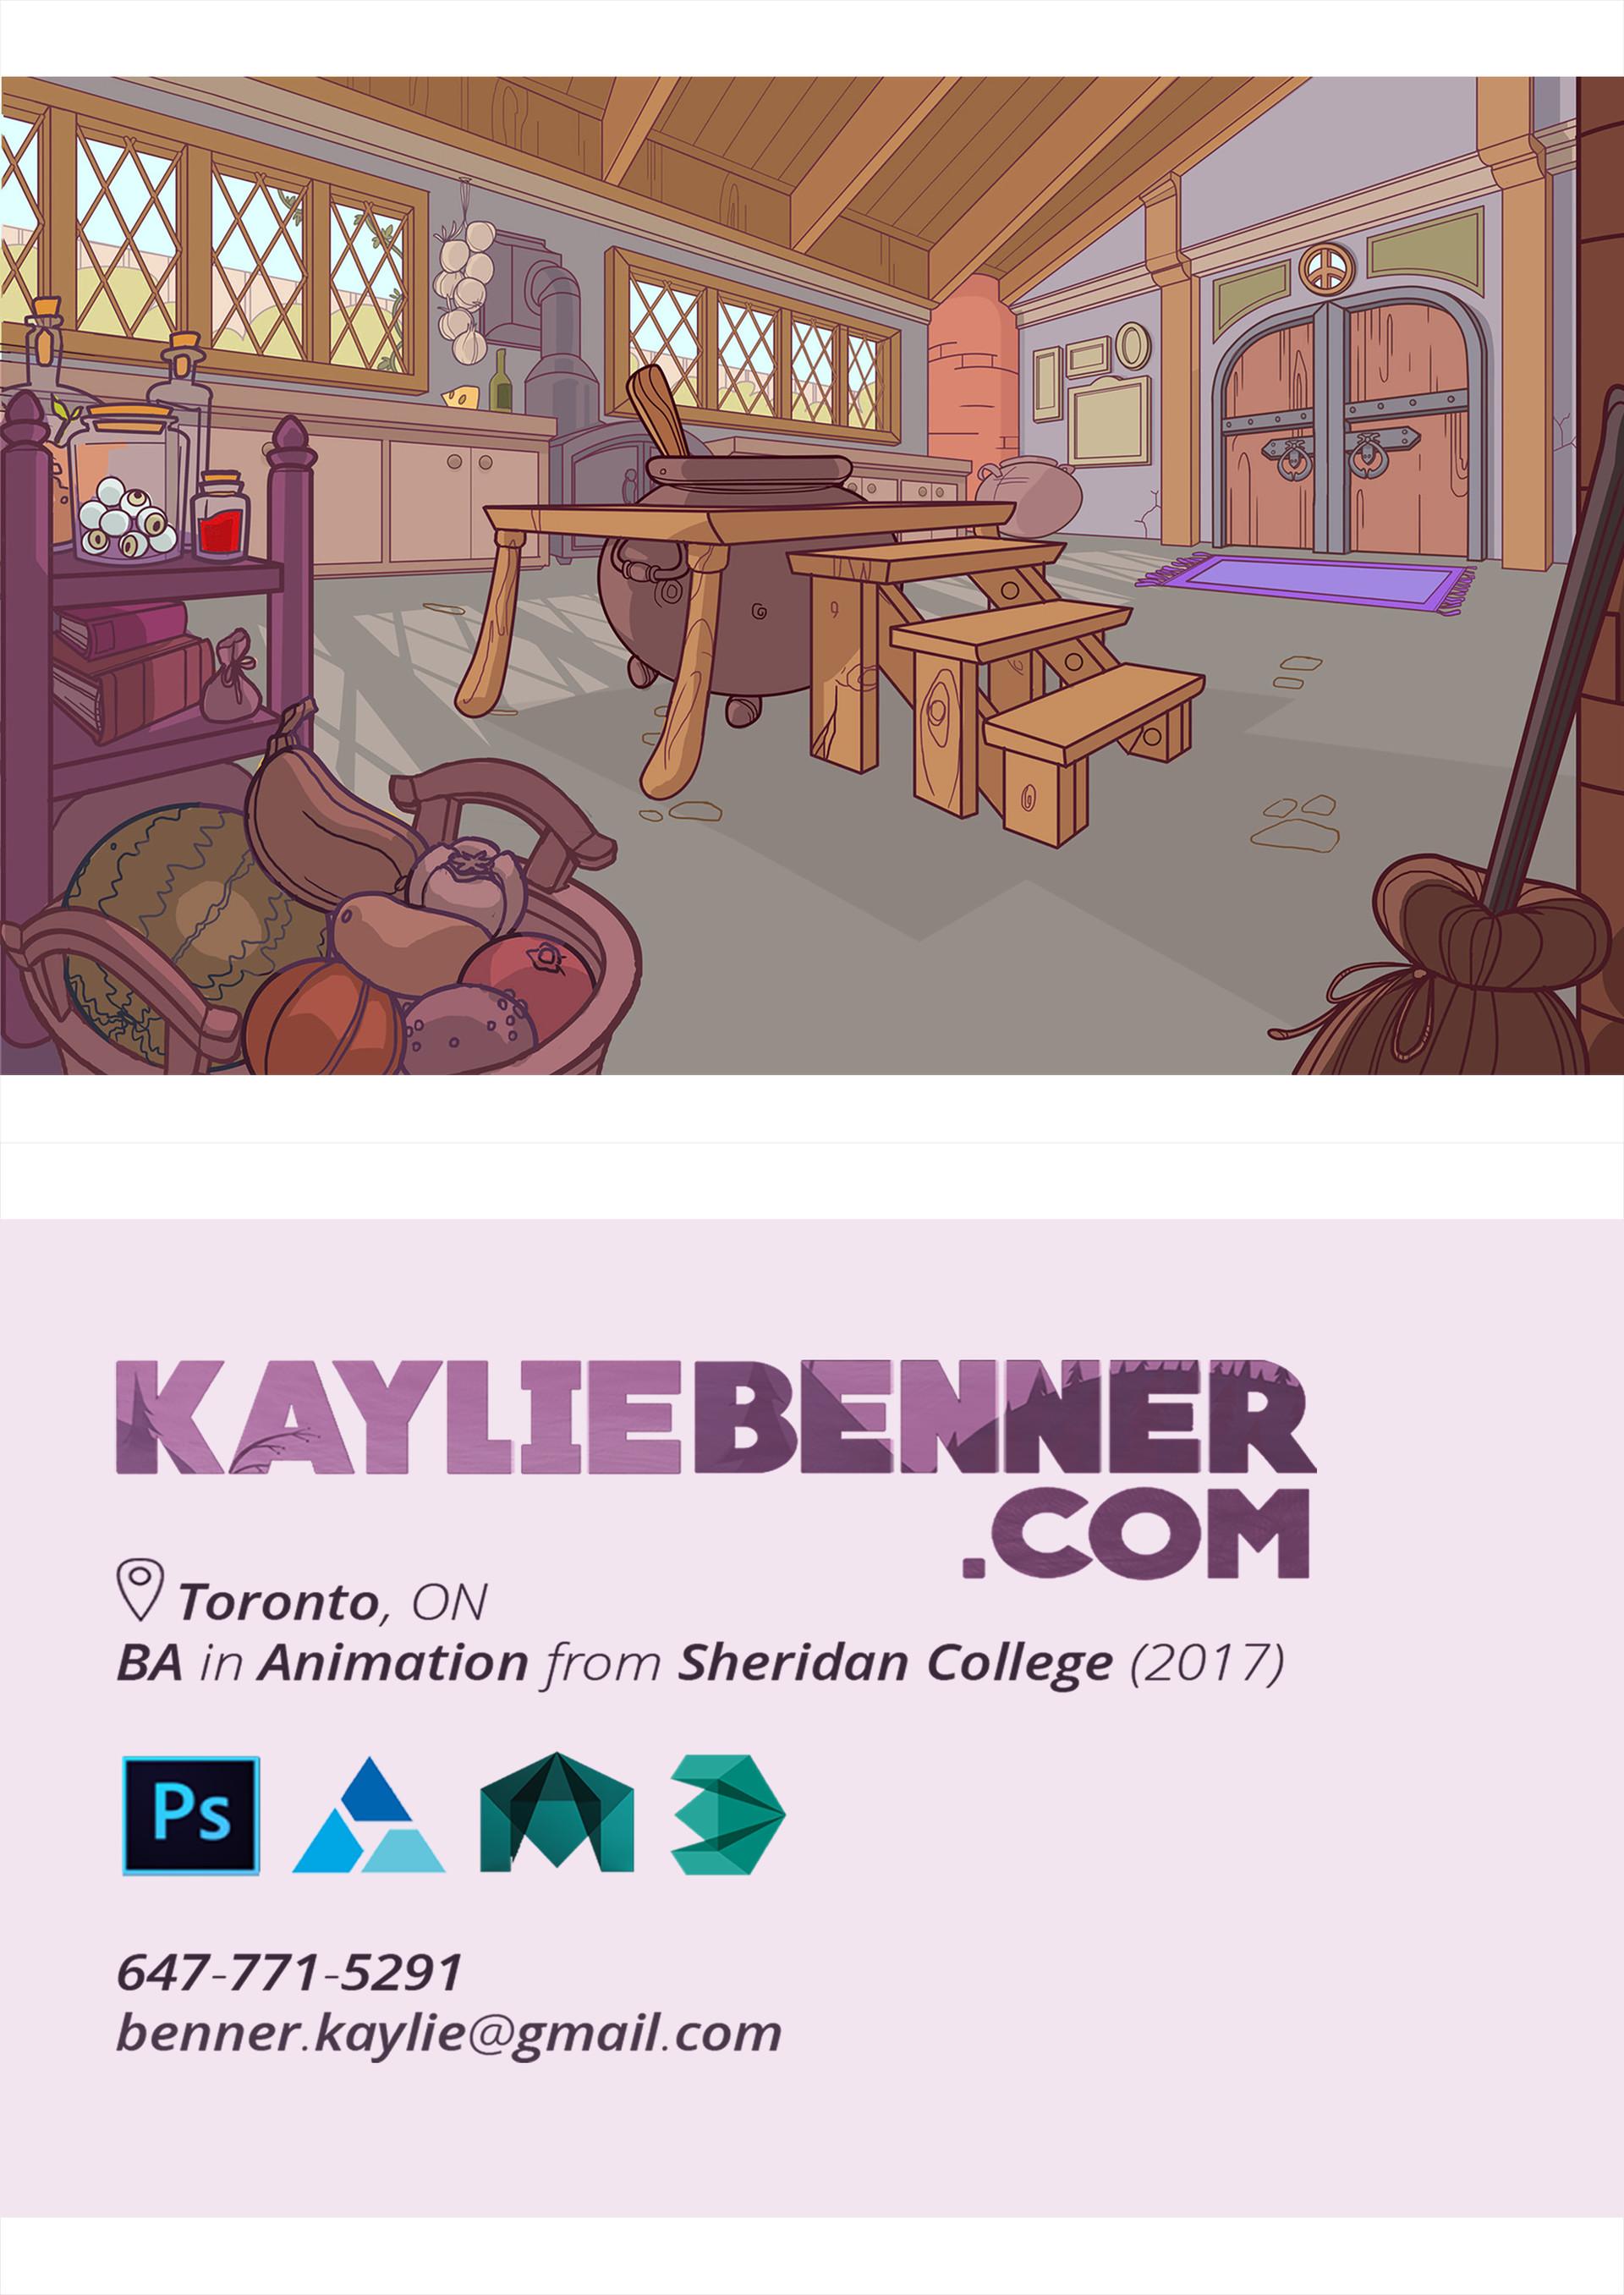 Kaylie benner postcard1